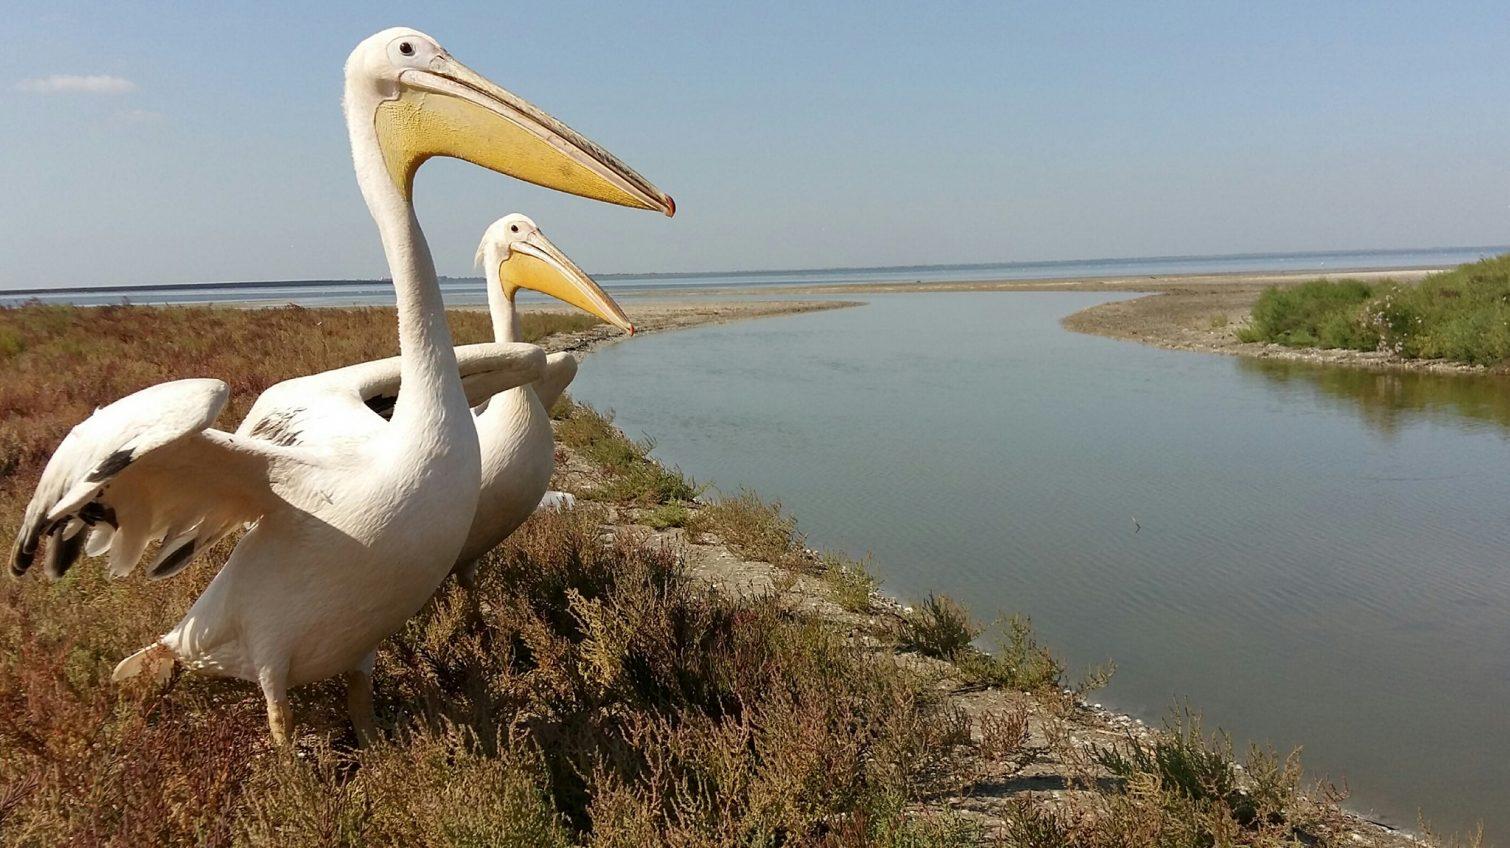 Из плена на волю: редких птиц из ресторана вернули в дикую природу (фото) «фото»